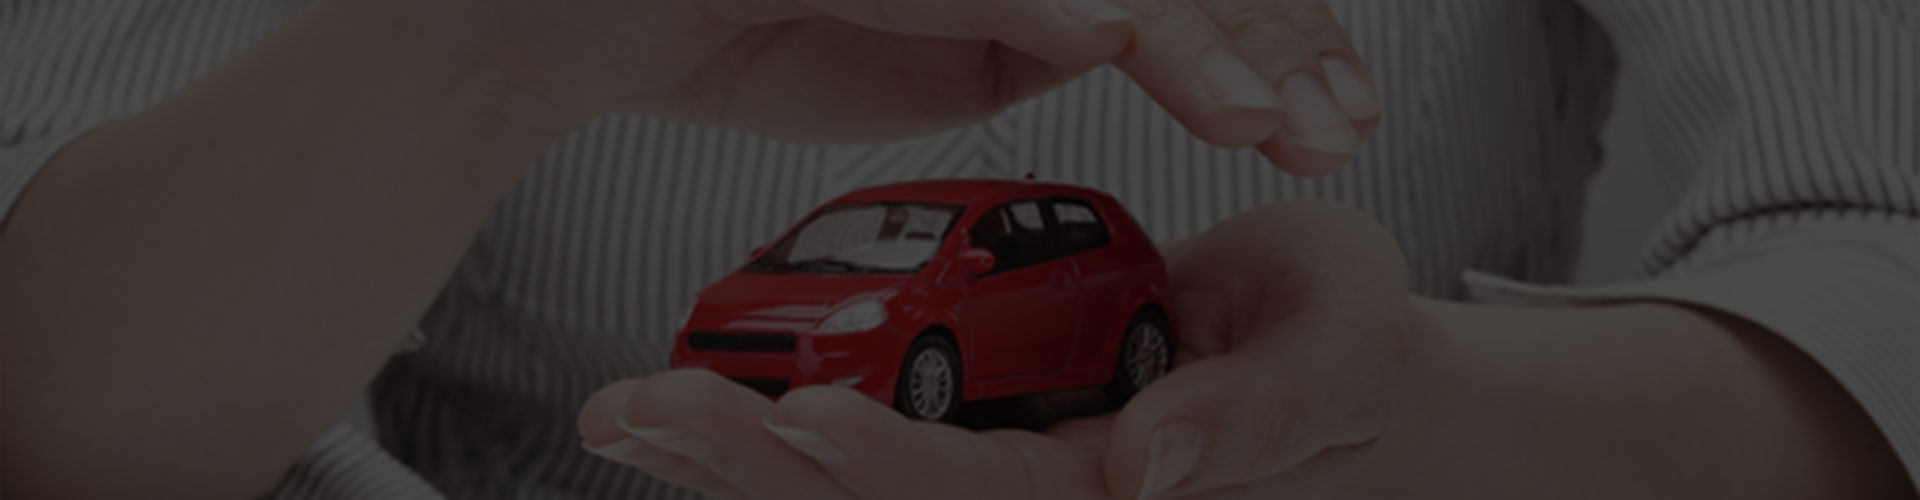 car_care